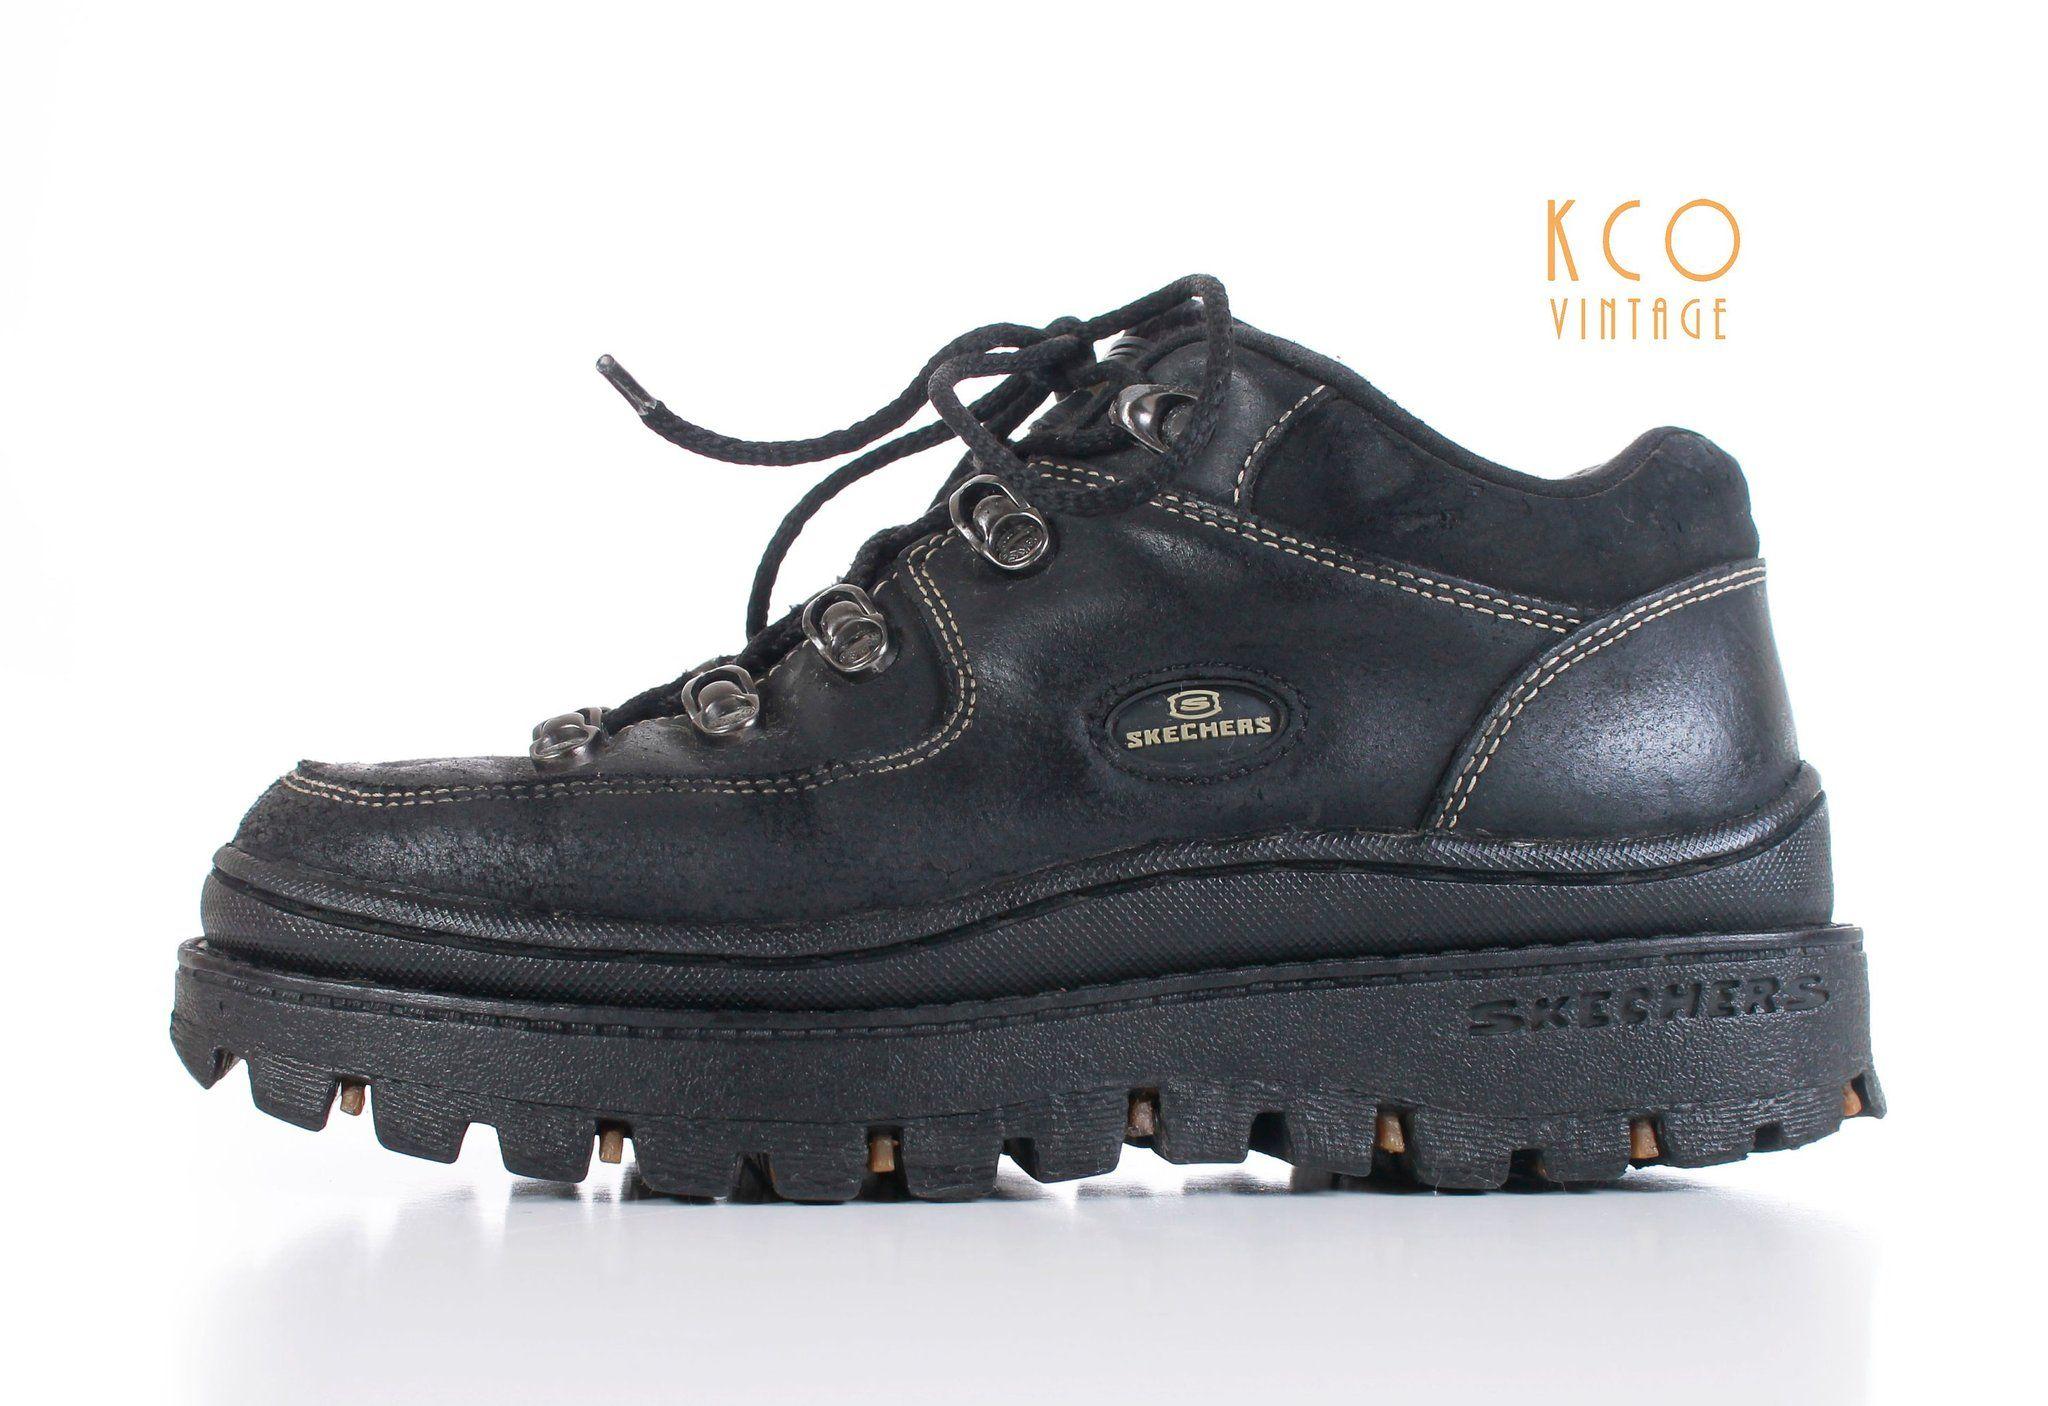 Platform Skechers Jammers Black Leather Lace Up Lug Sole 90 S